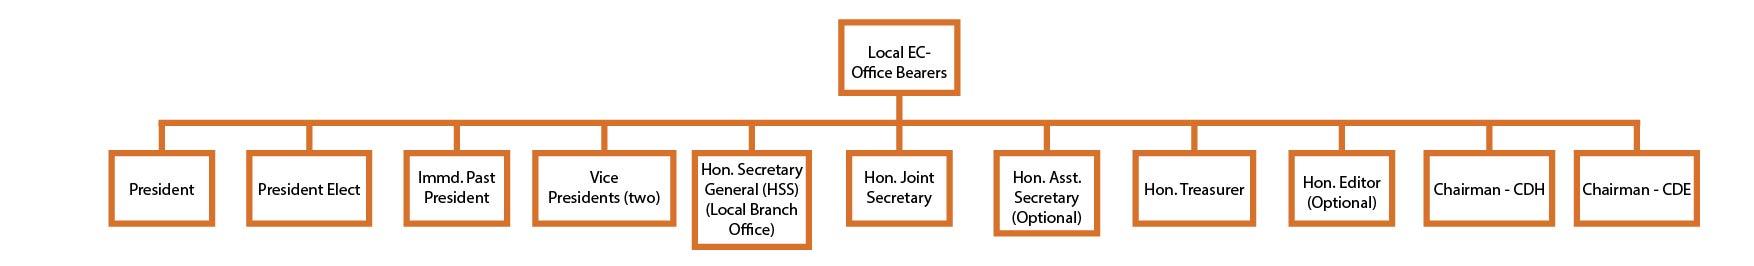 Local Executive Council Office Bearers